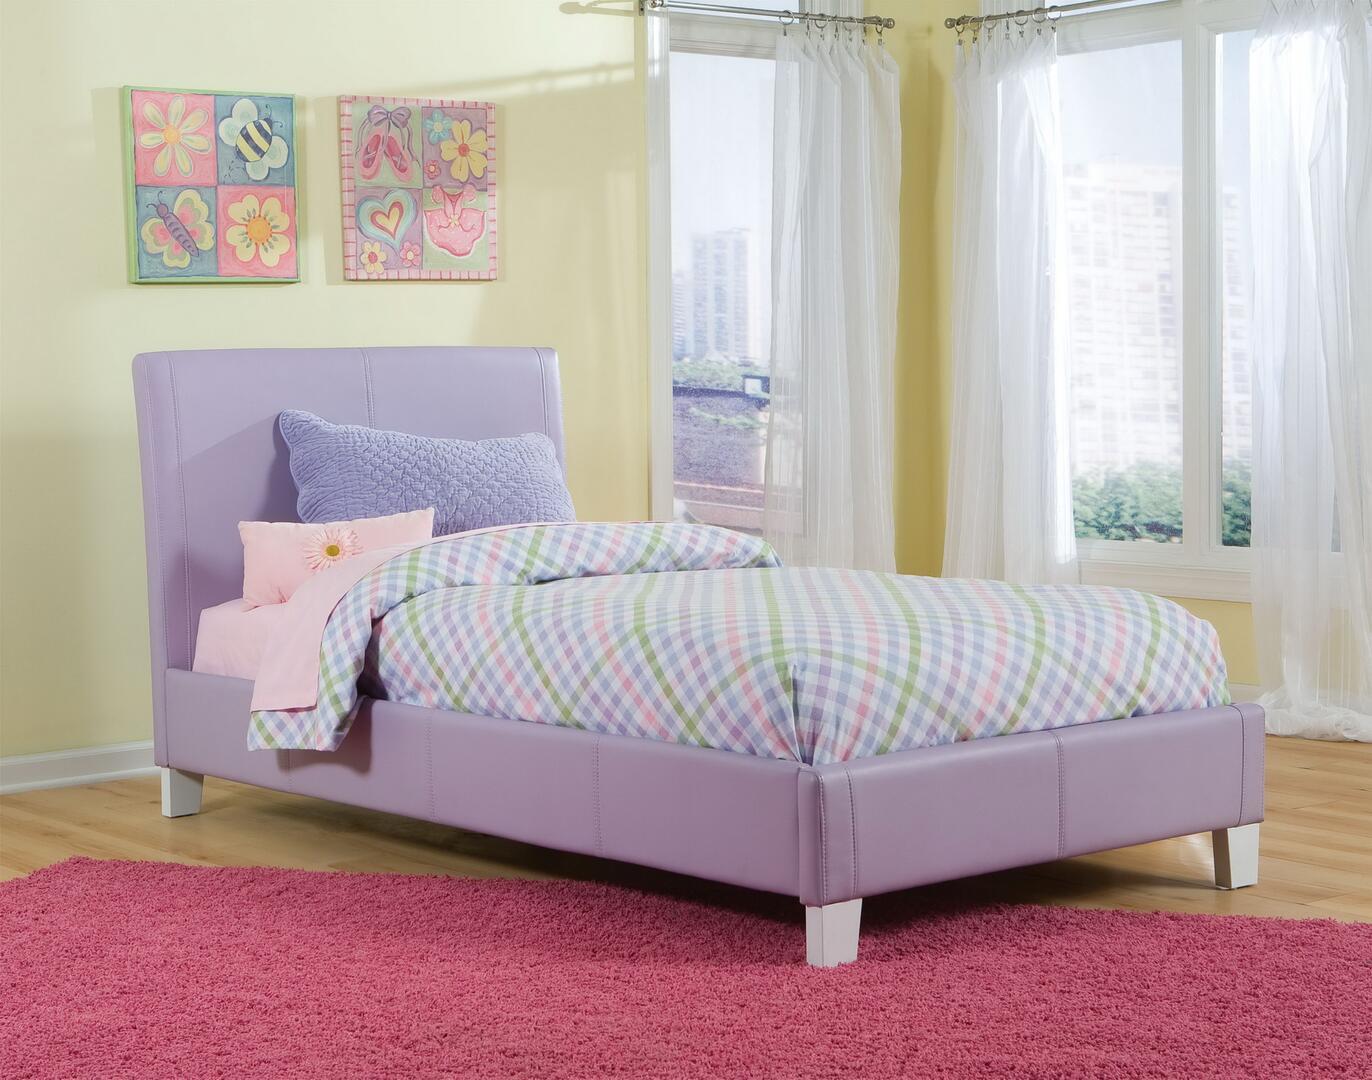 standard furniture 60772a fantasia series full size panel bed appliances connection. Black Bedroom Furniture Sets. Home Design Ideas